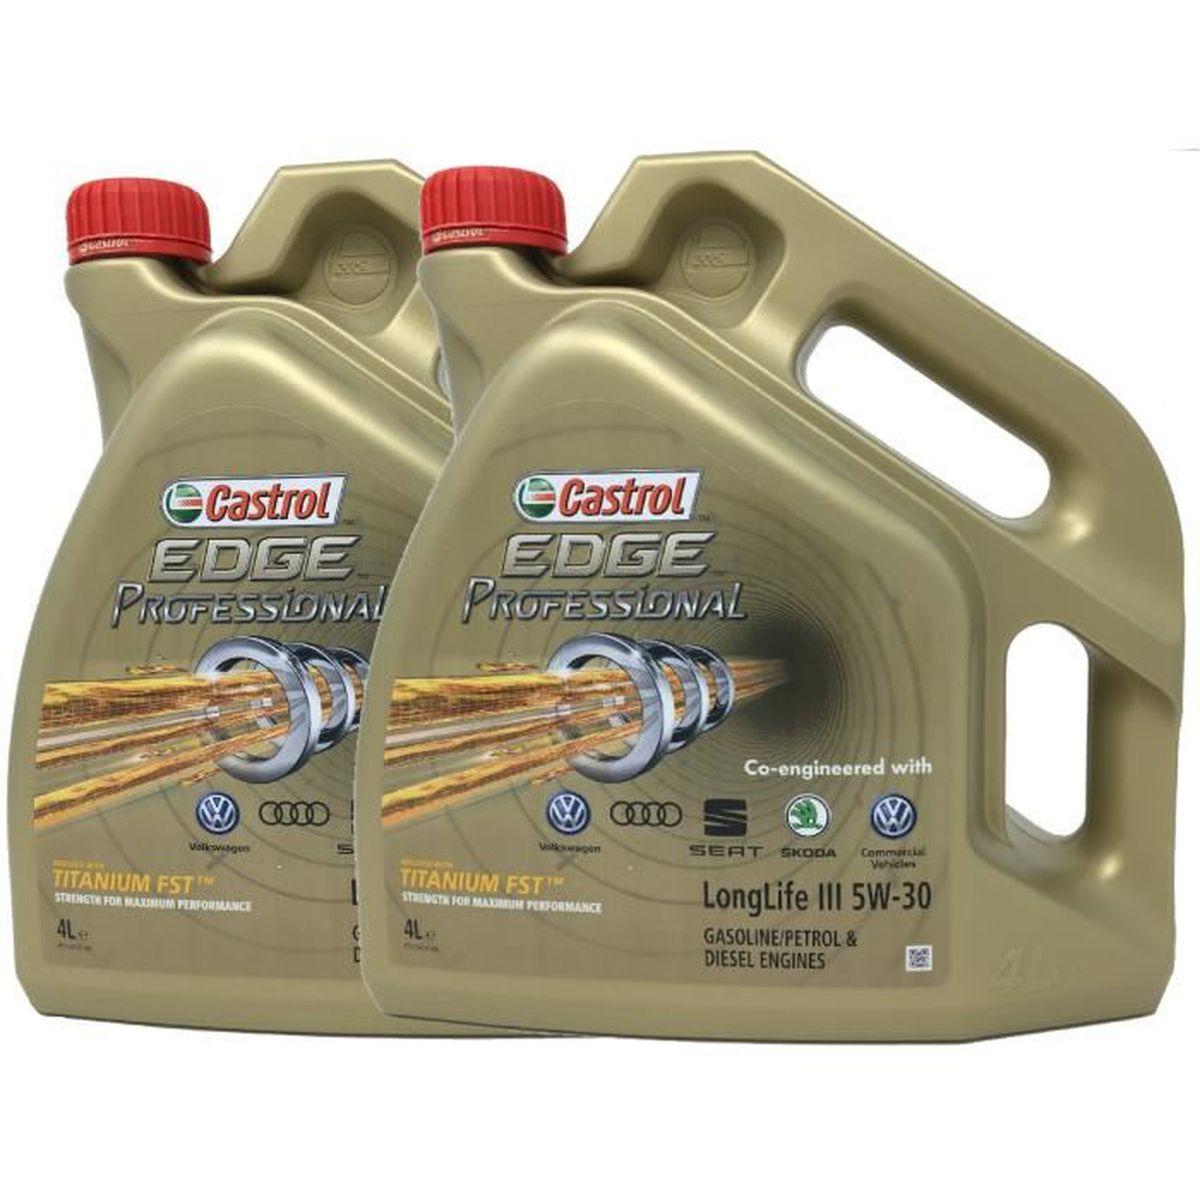 HUILE MOTEUR Huile moteur Castrol Edge Professional Long Life I